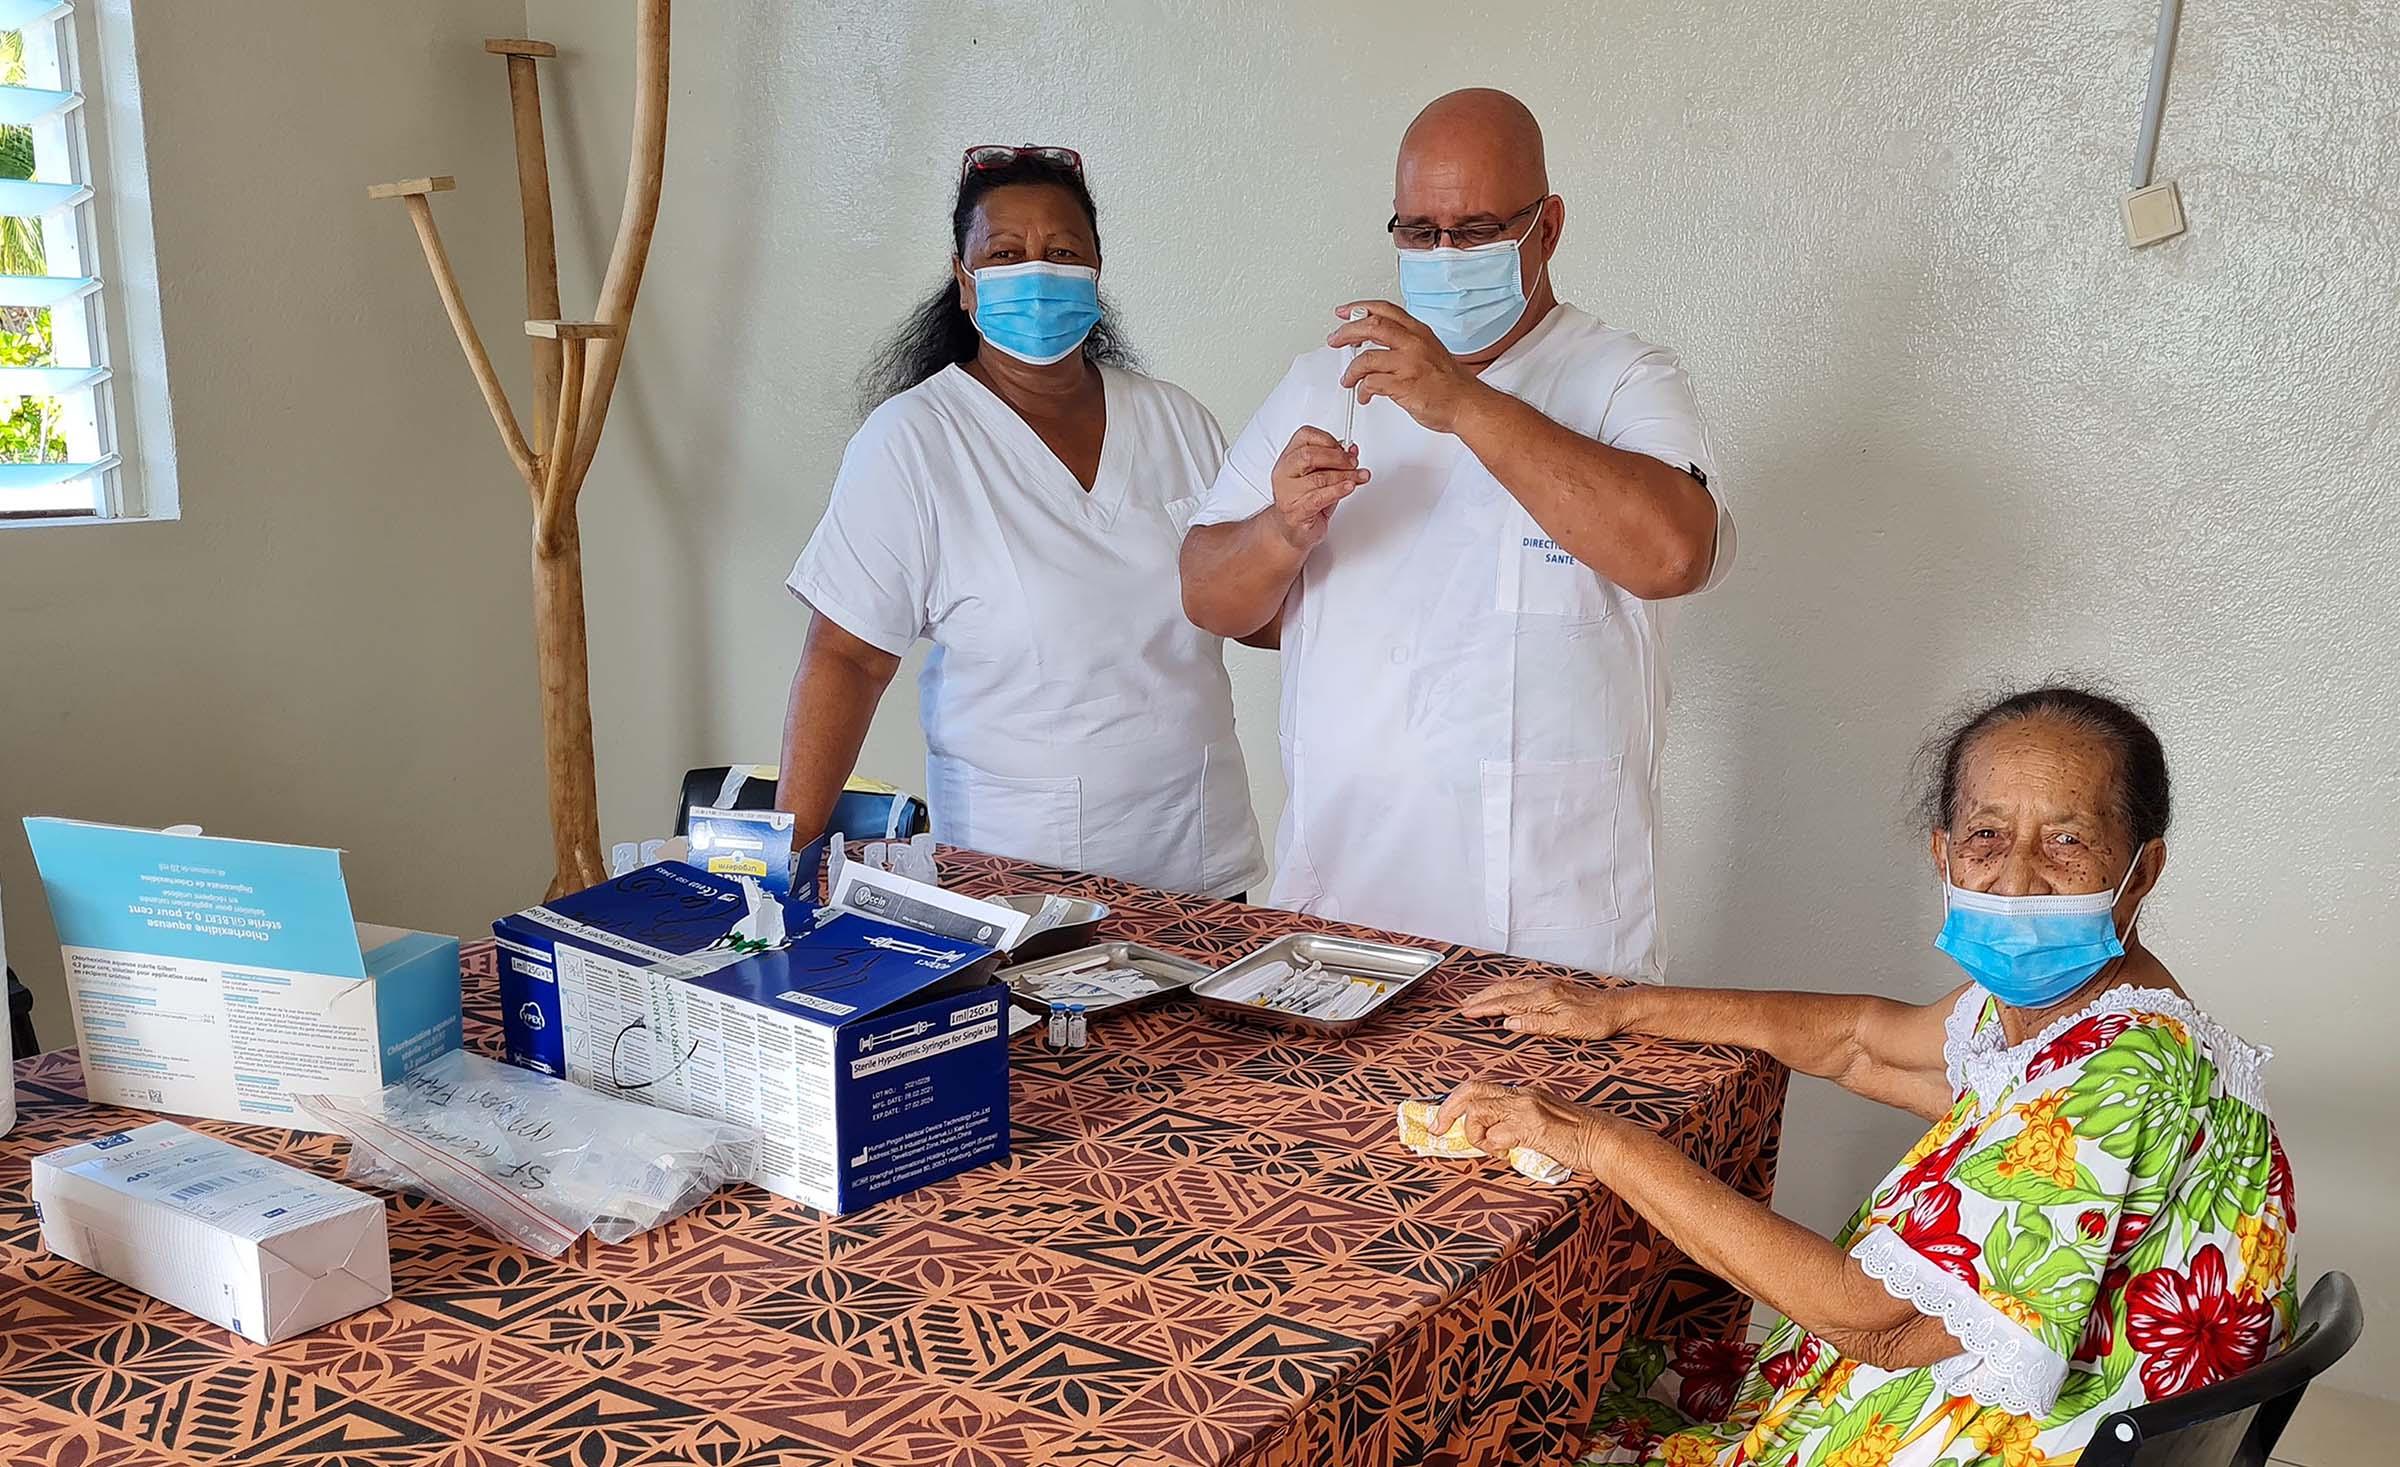 La vaccination s'organise dans les Tuamotu